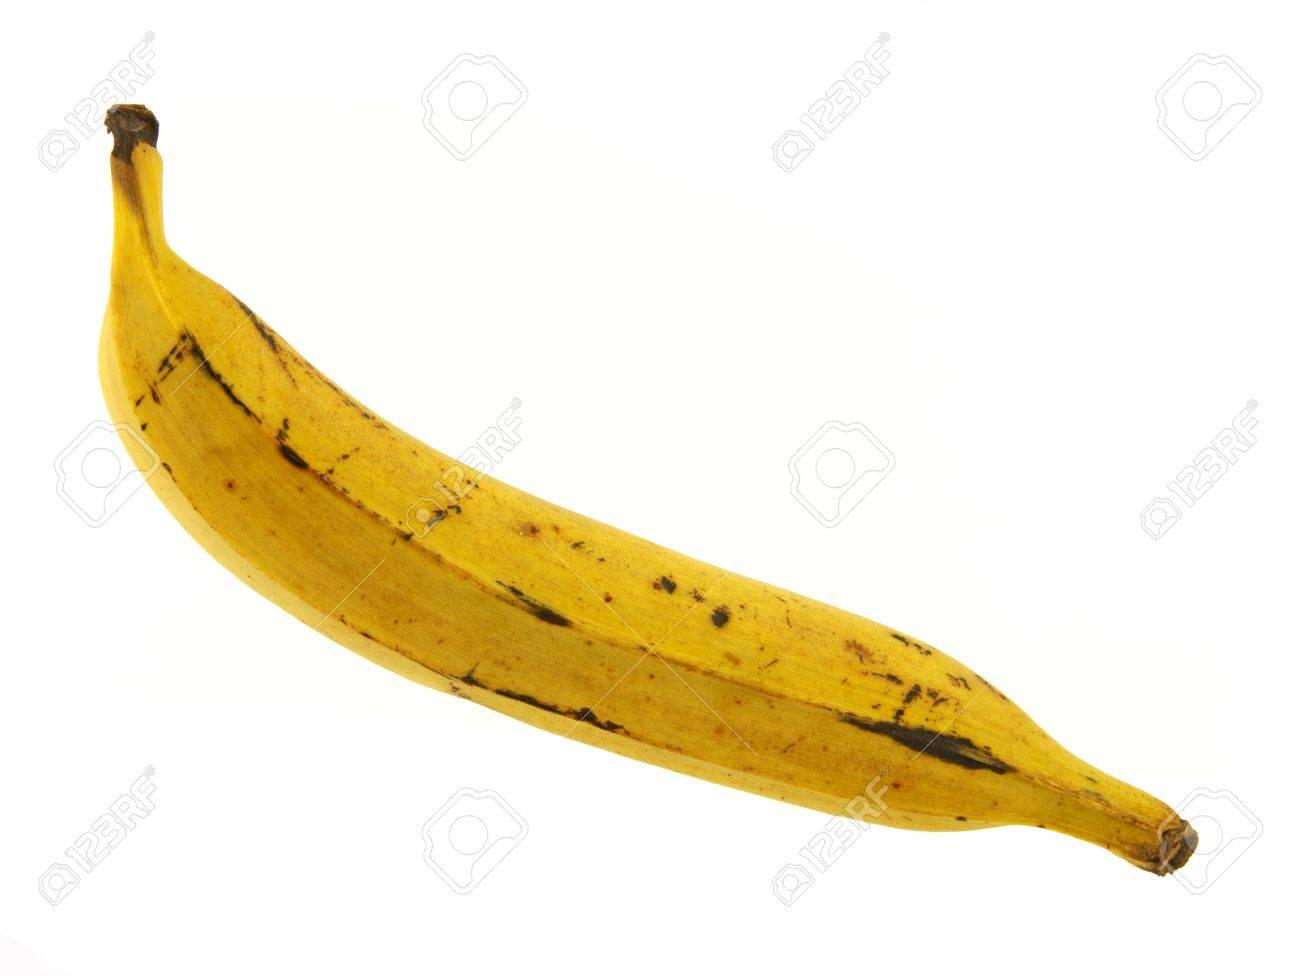 A single yellow ripe plantain banana against a white background. Stock Photo - 5941094